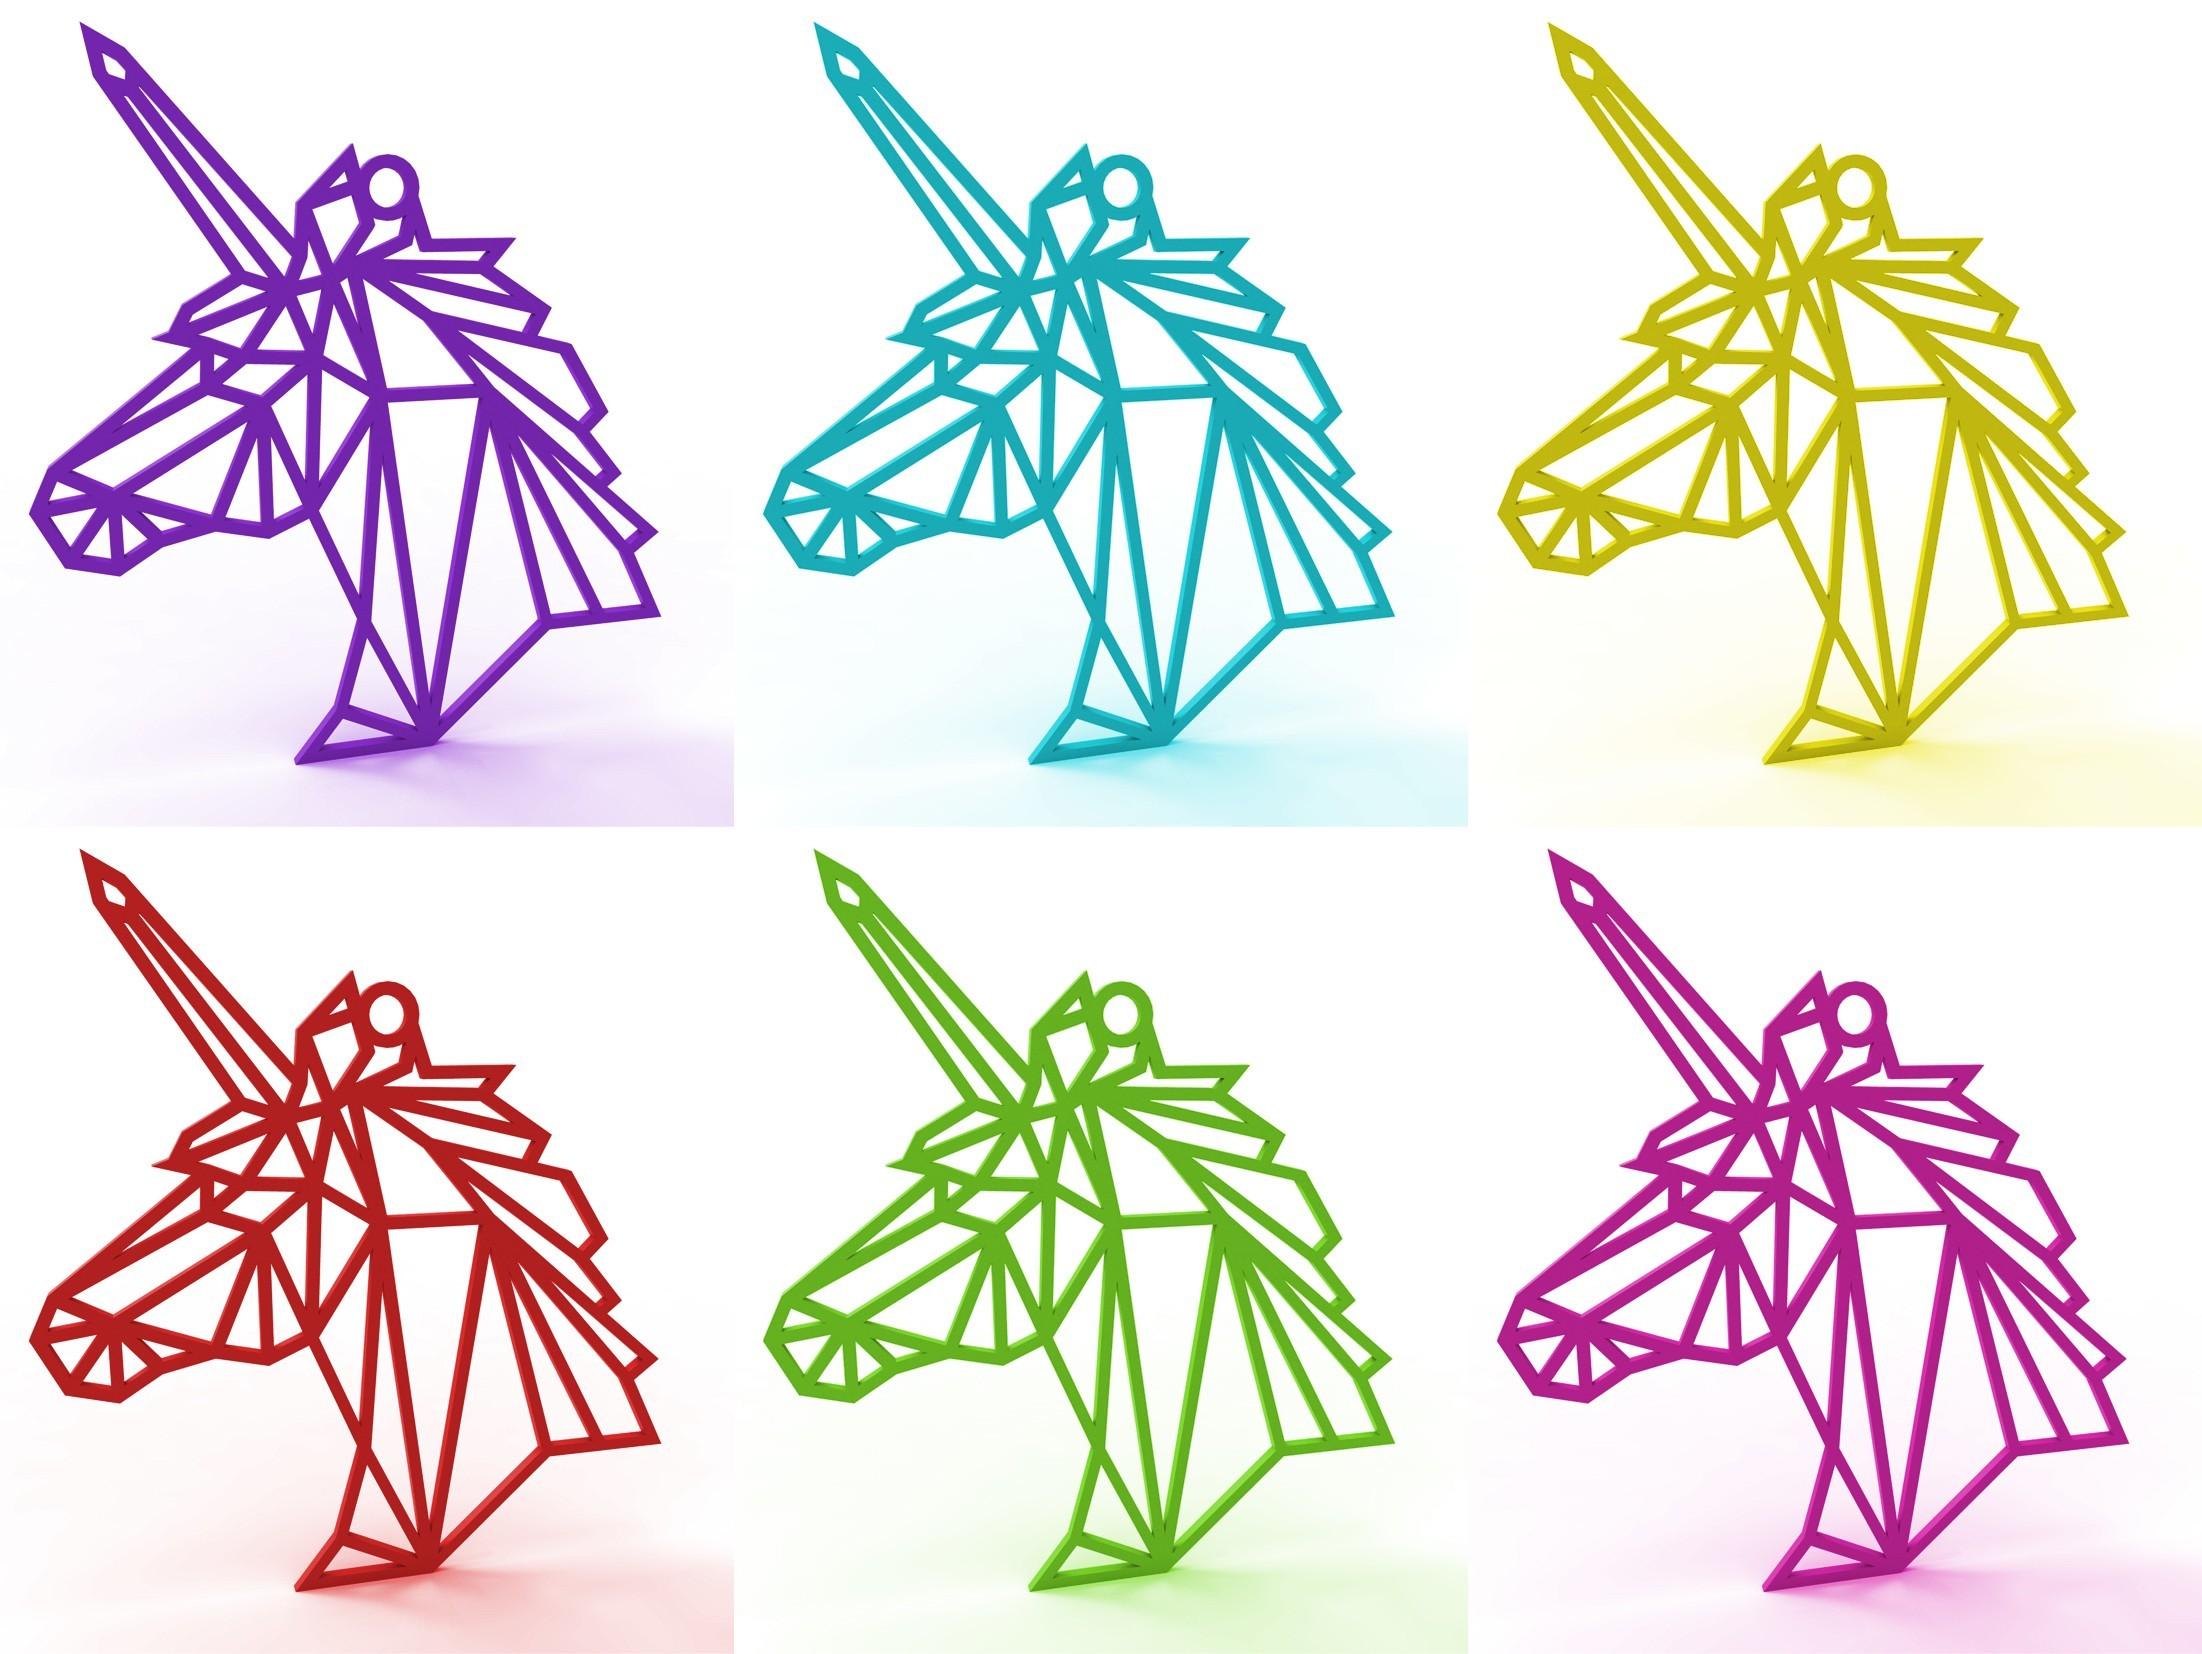 unicorn necklace (colors).jpg Download STL file Unicorn Necklace • 3D printer object, TutoSolid